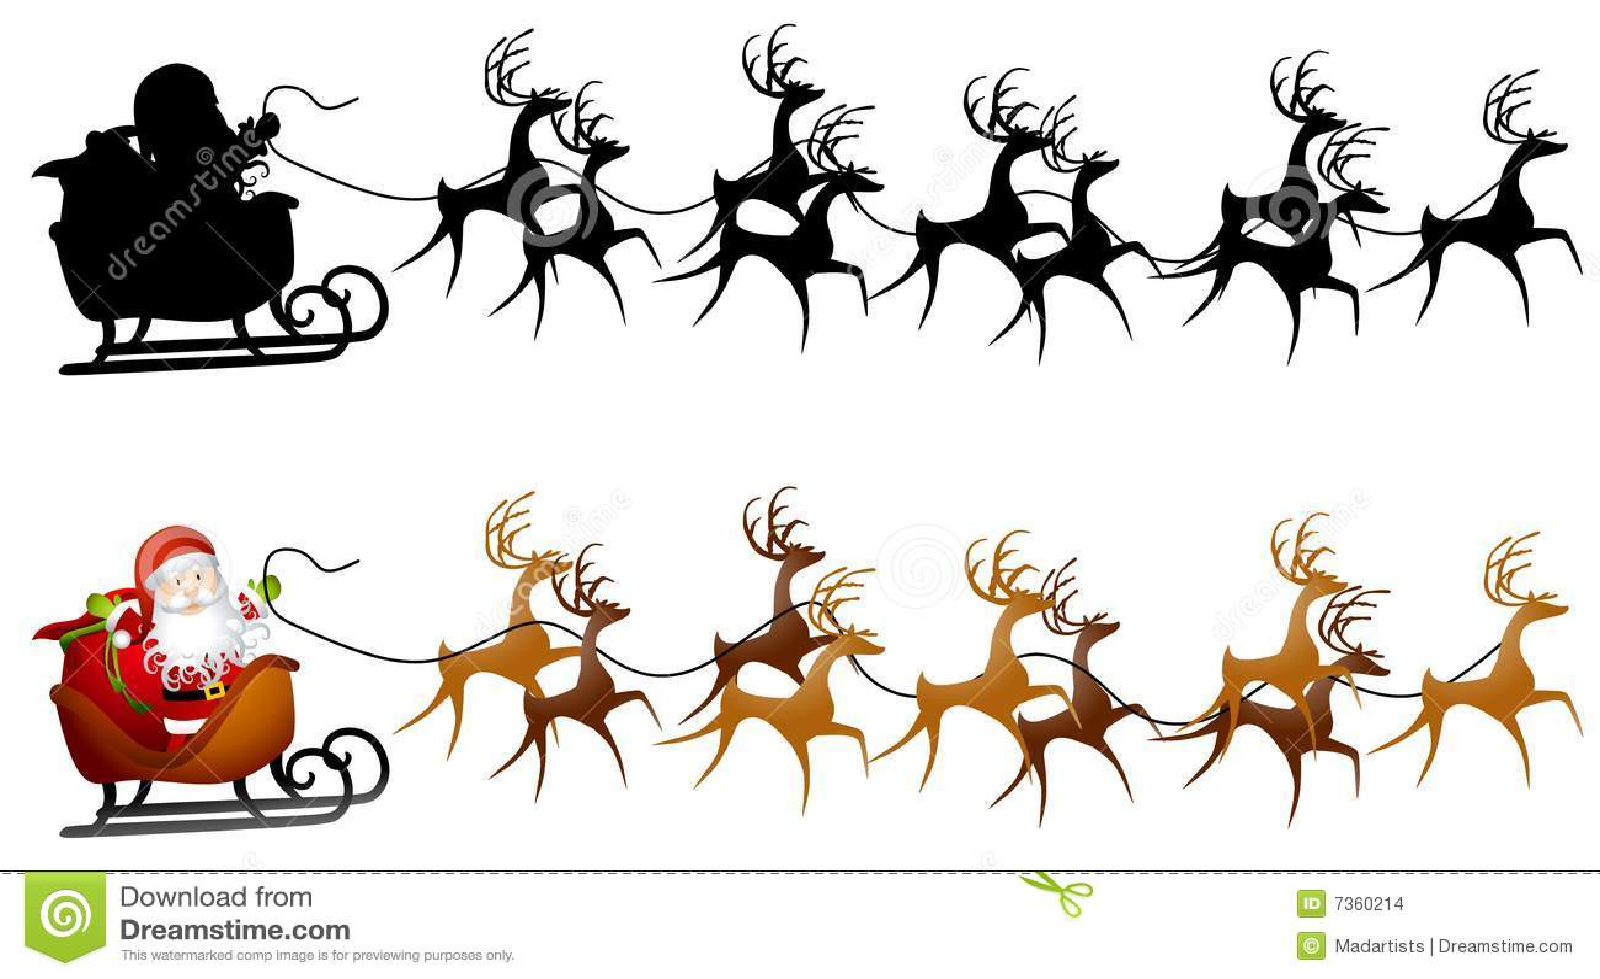 santa sleigh clip art stock illustration illustration of rh dreamstime com sleigh santa claus clipart santa and sleigh silhouette clipart